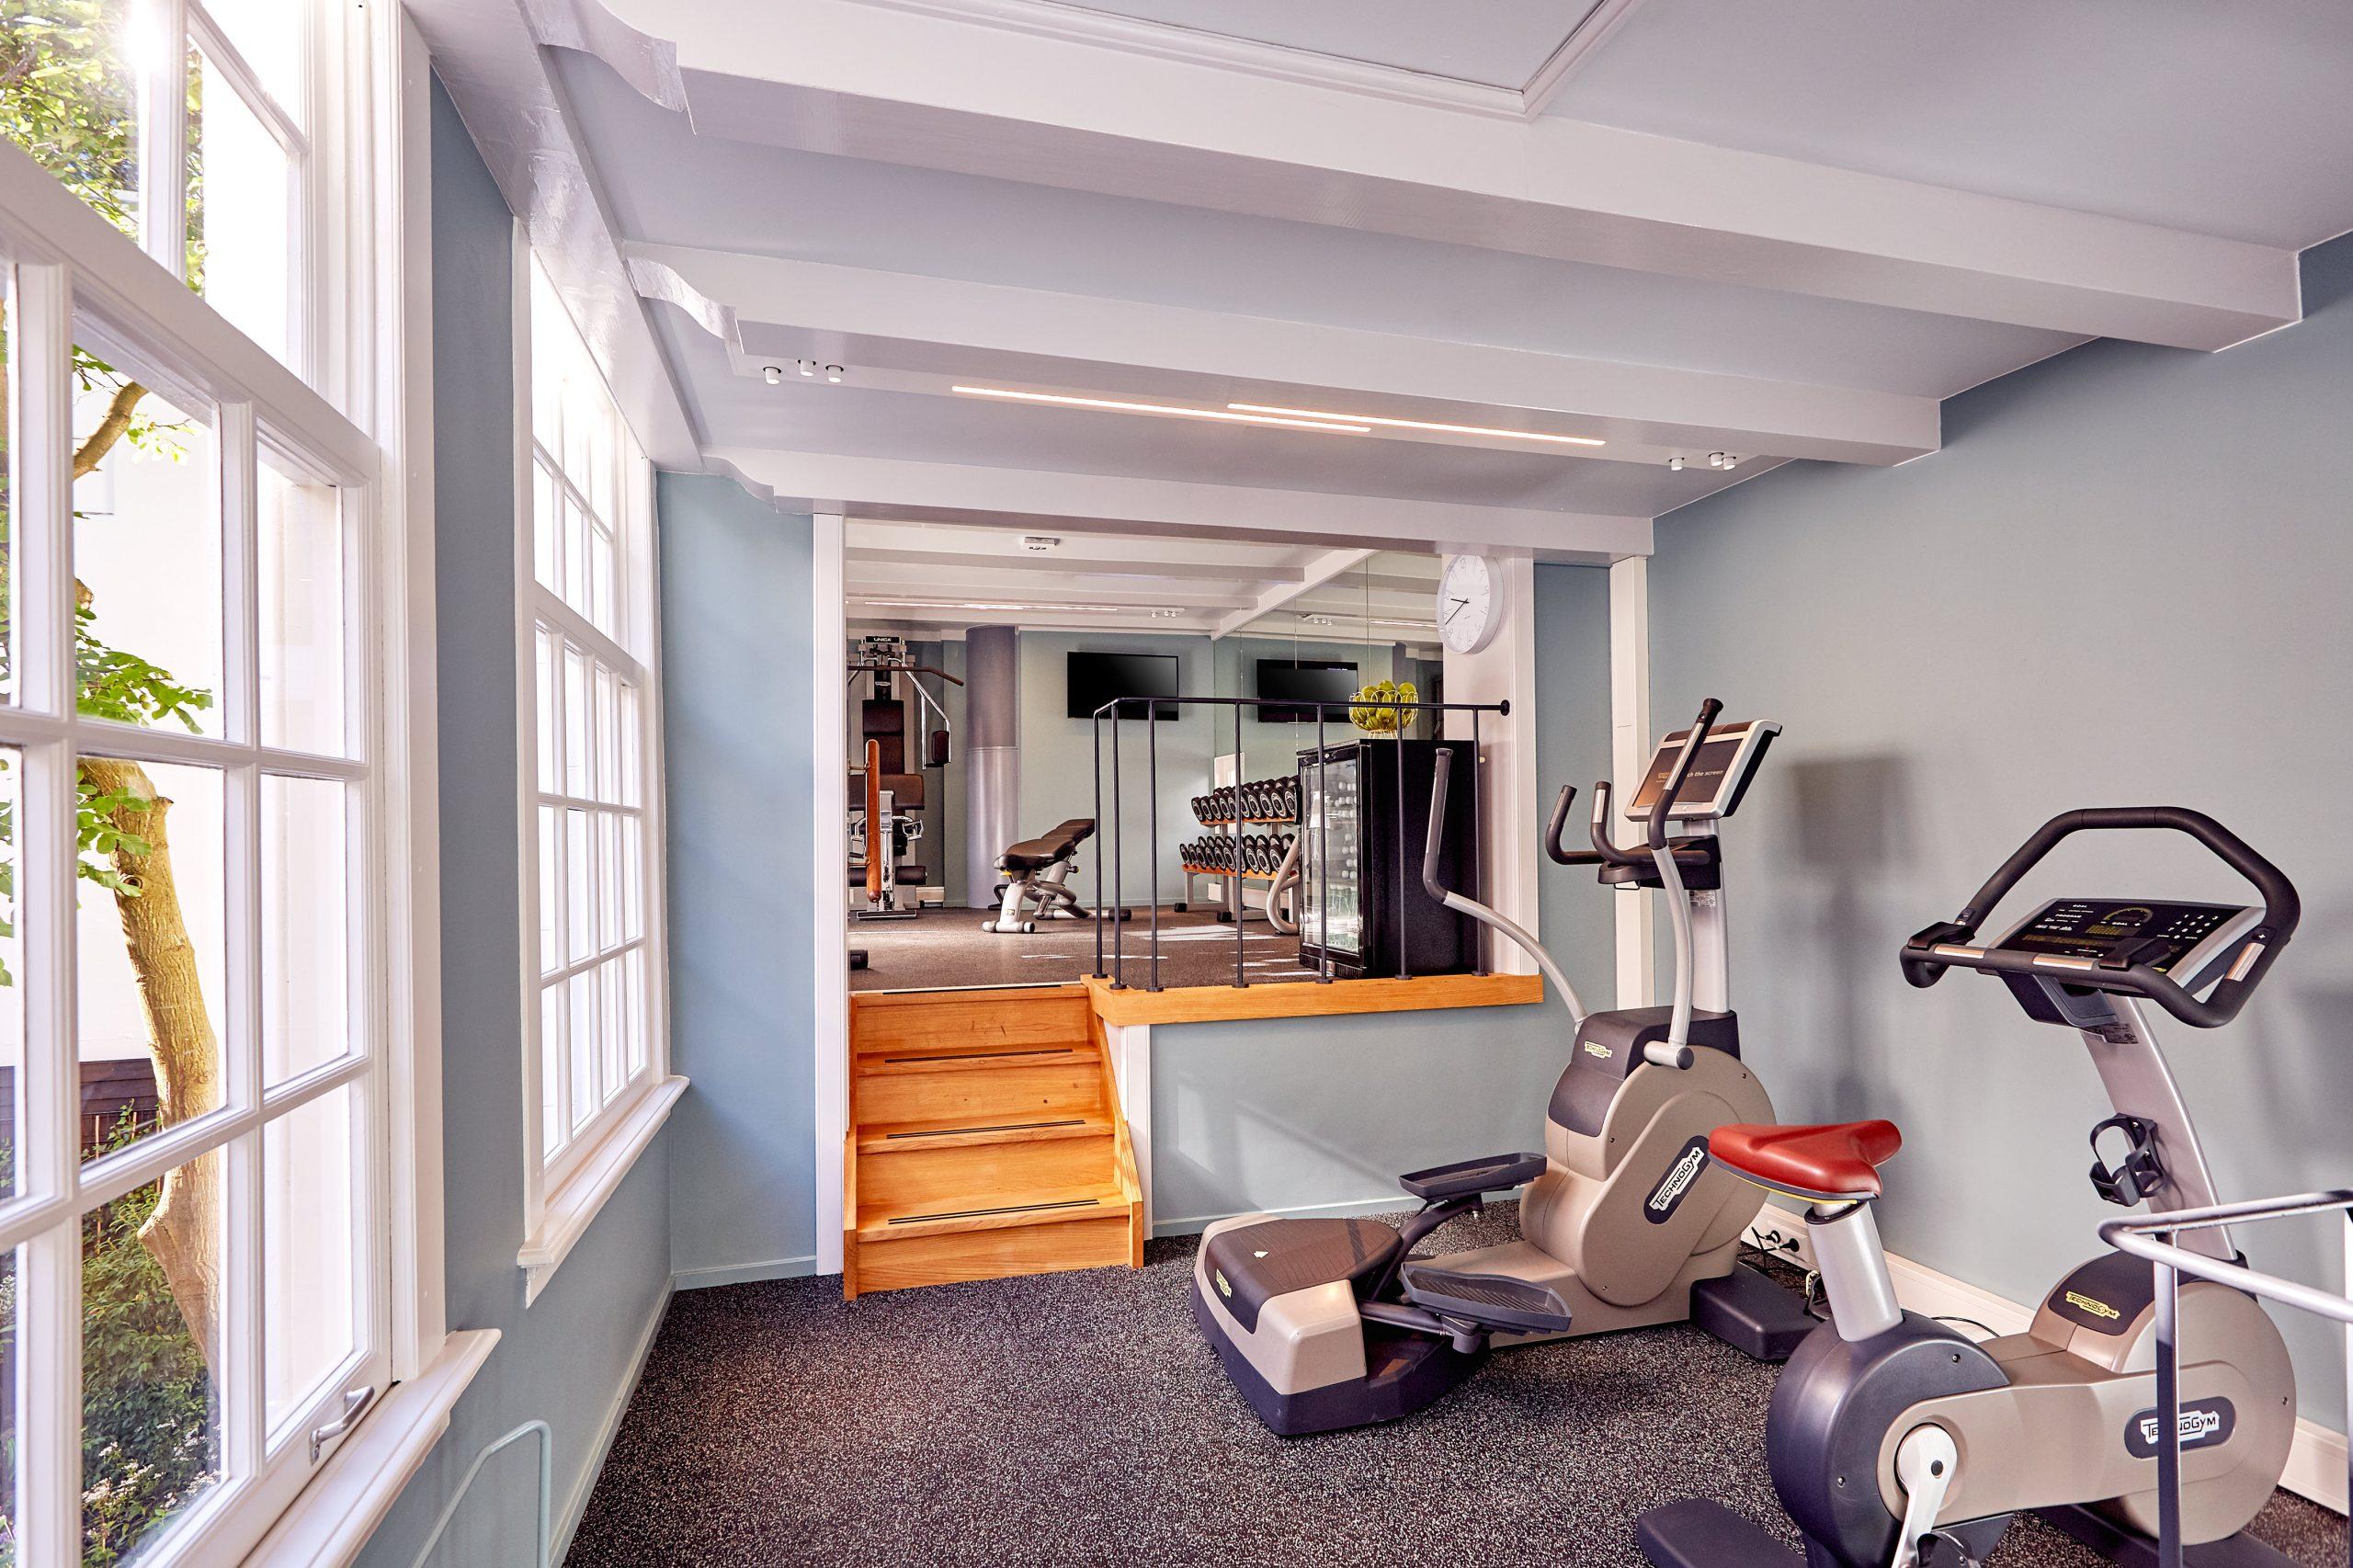 Gym - Upstairs